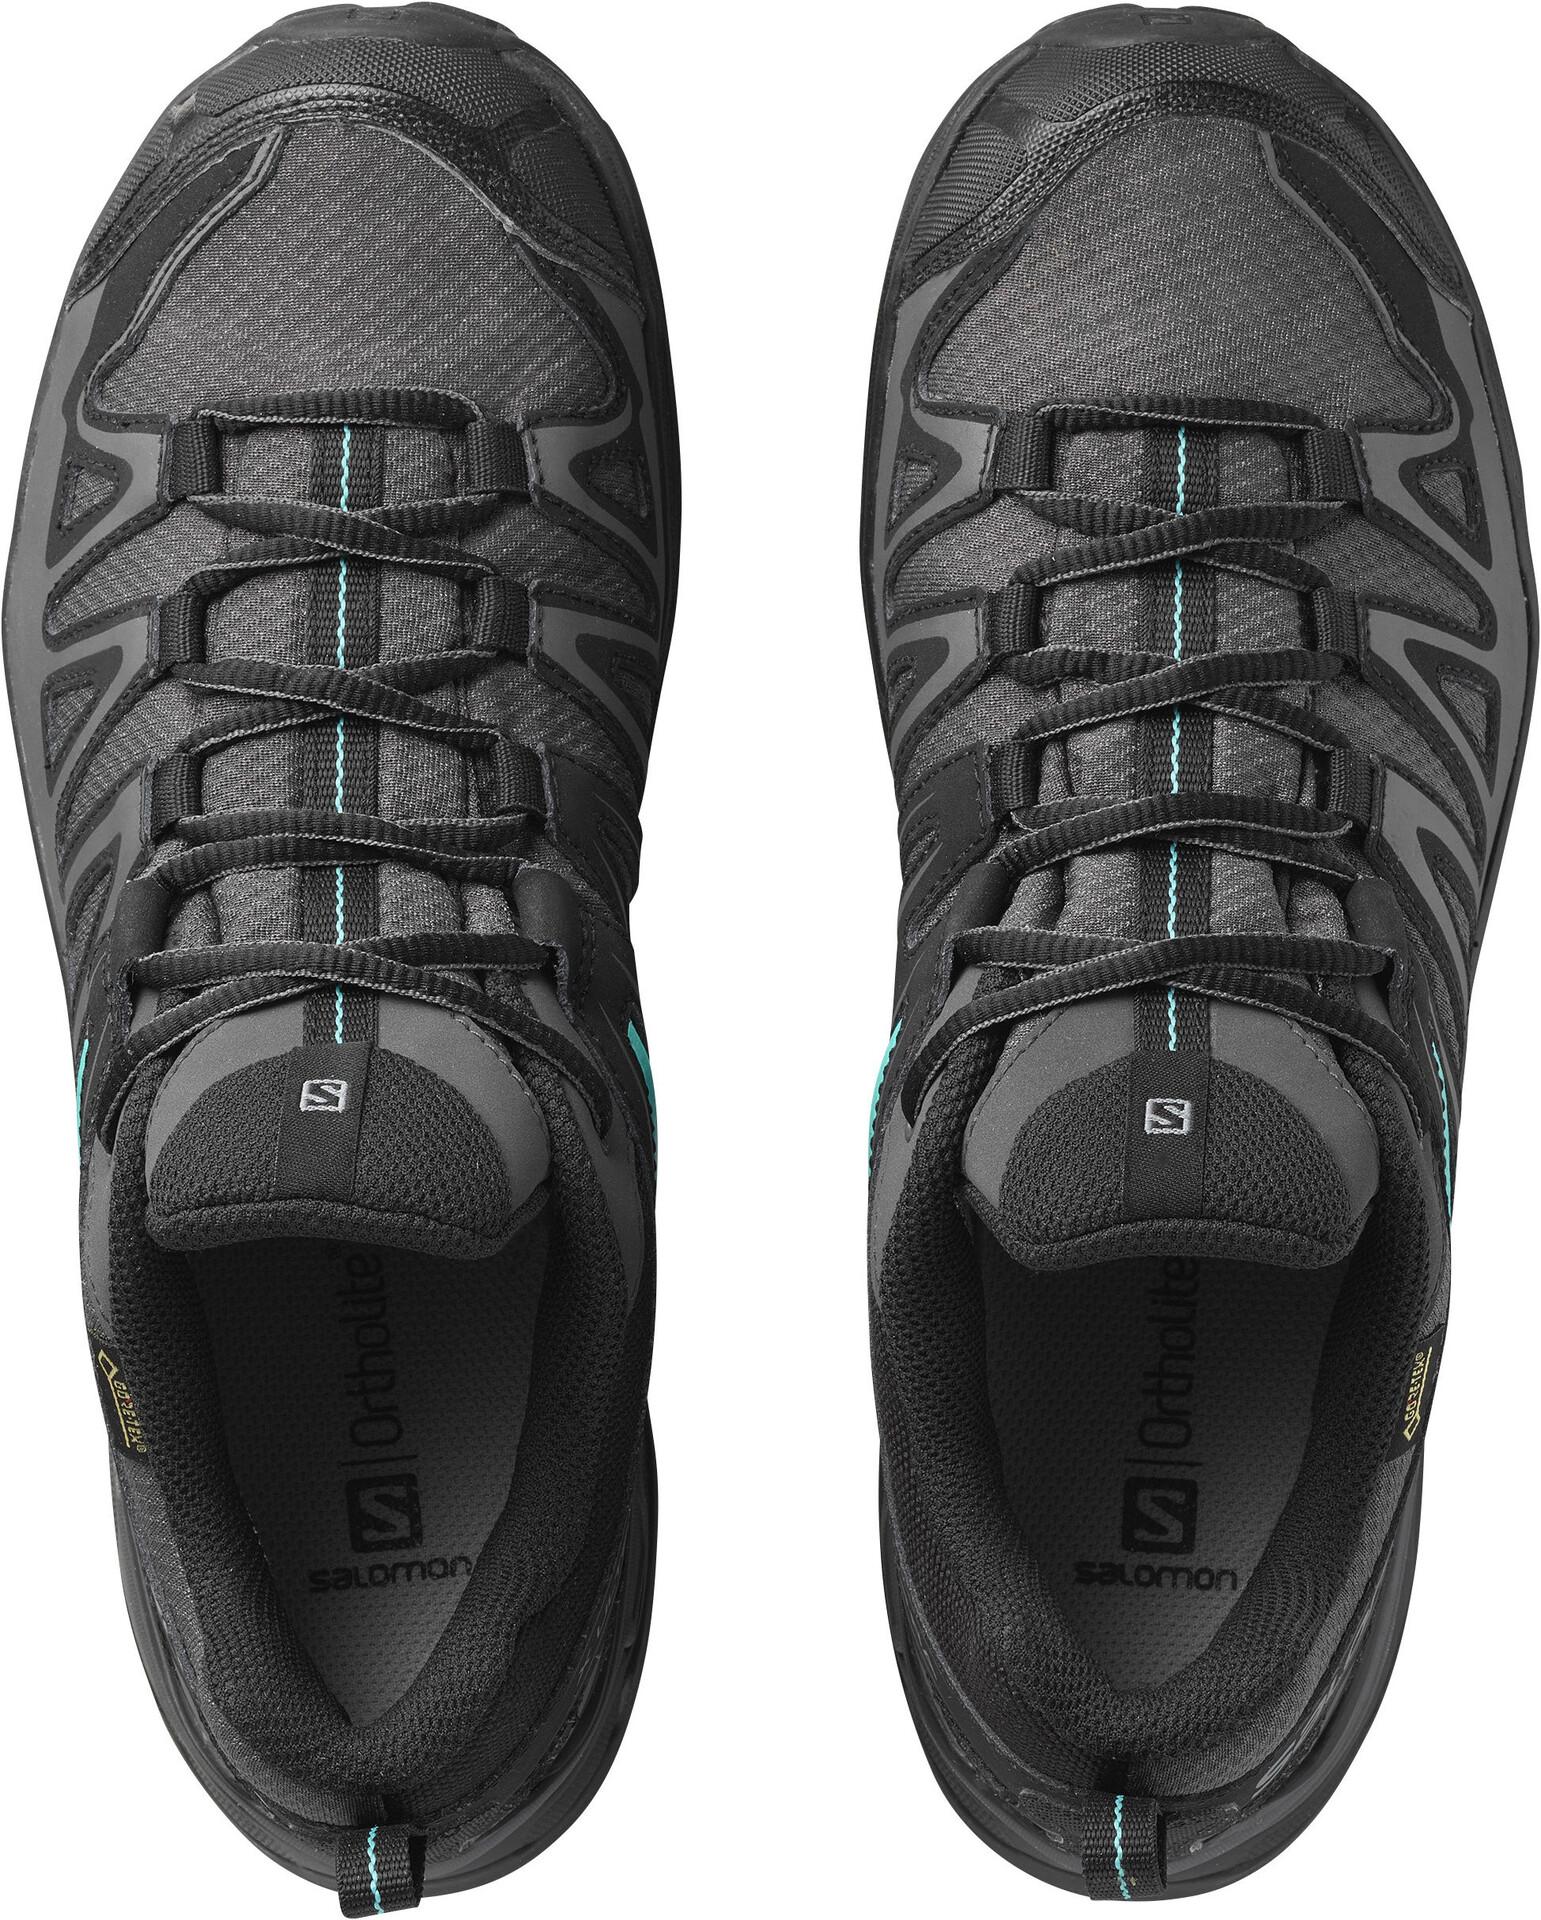 Salomon X Ultra 3 GTX Hiking Schuhe Women Magnet Black